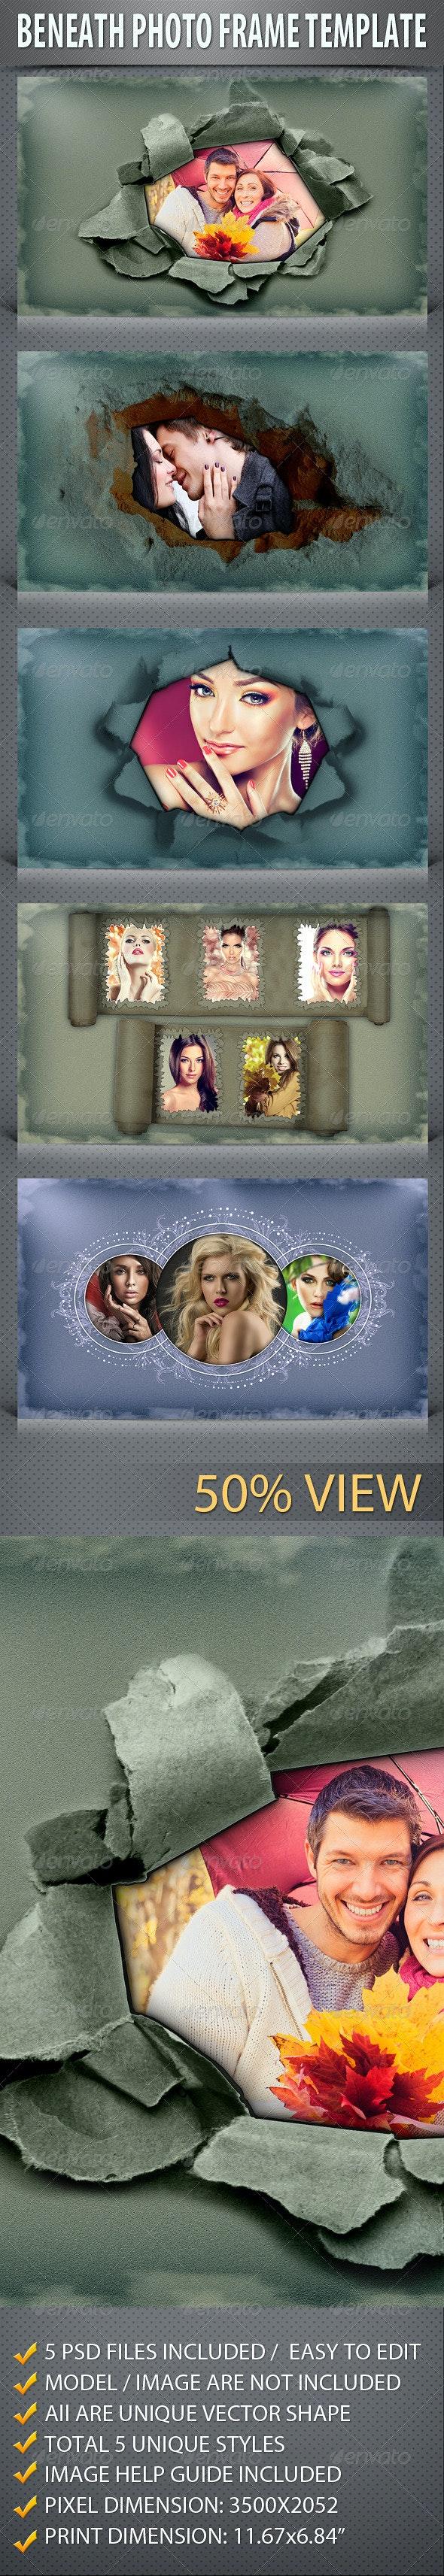 Beneath Photo Frame Template - Photo Templates Graphics